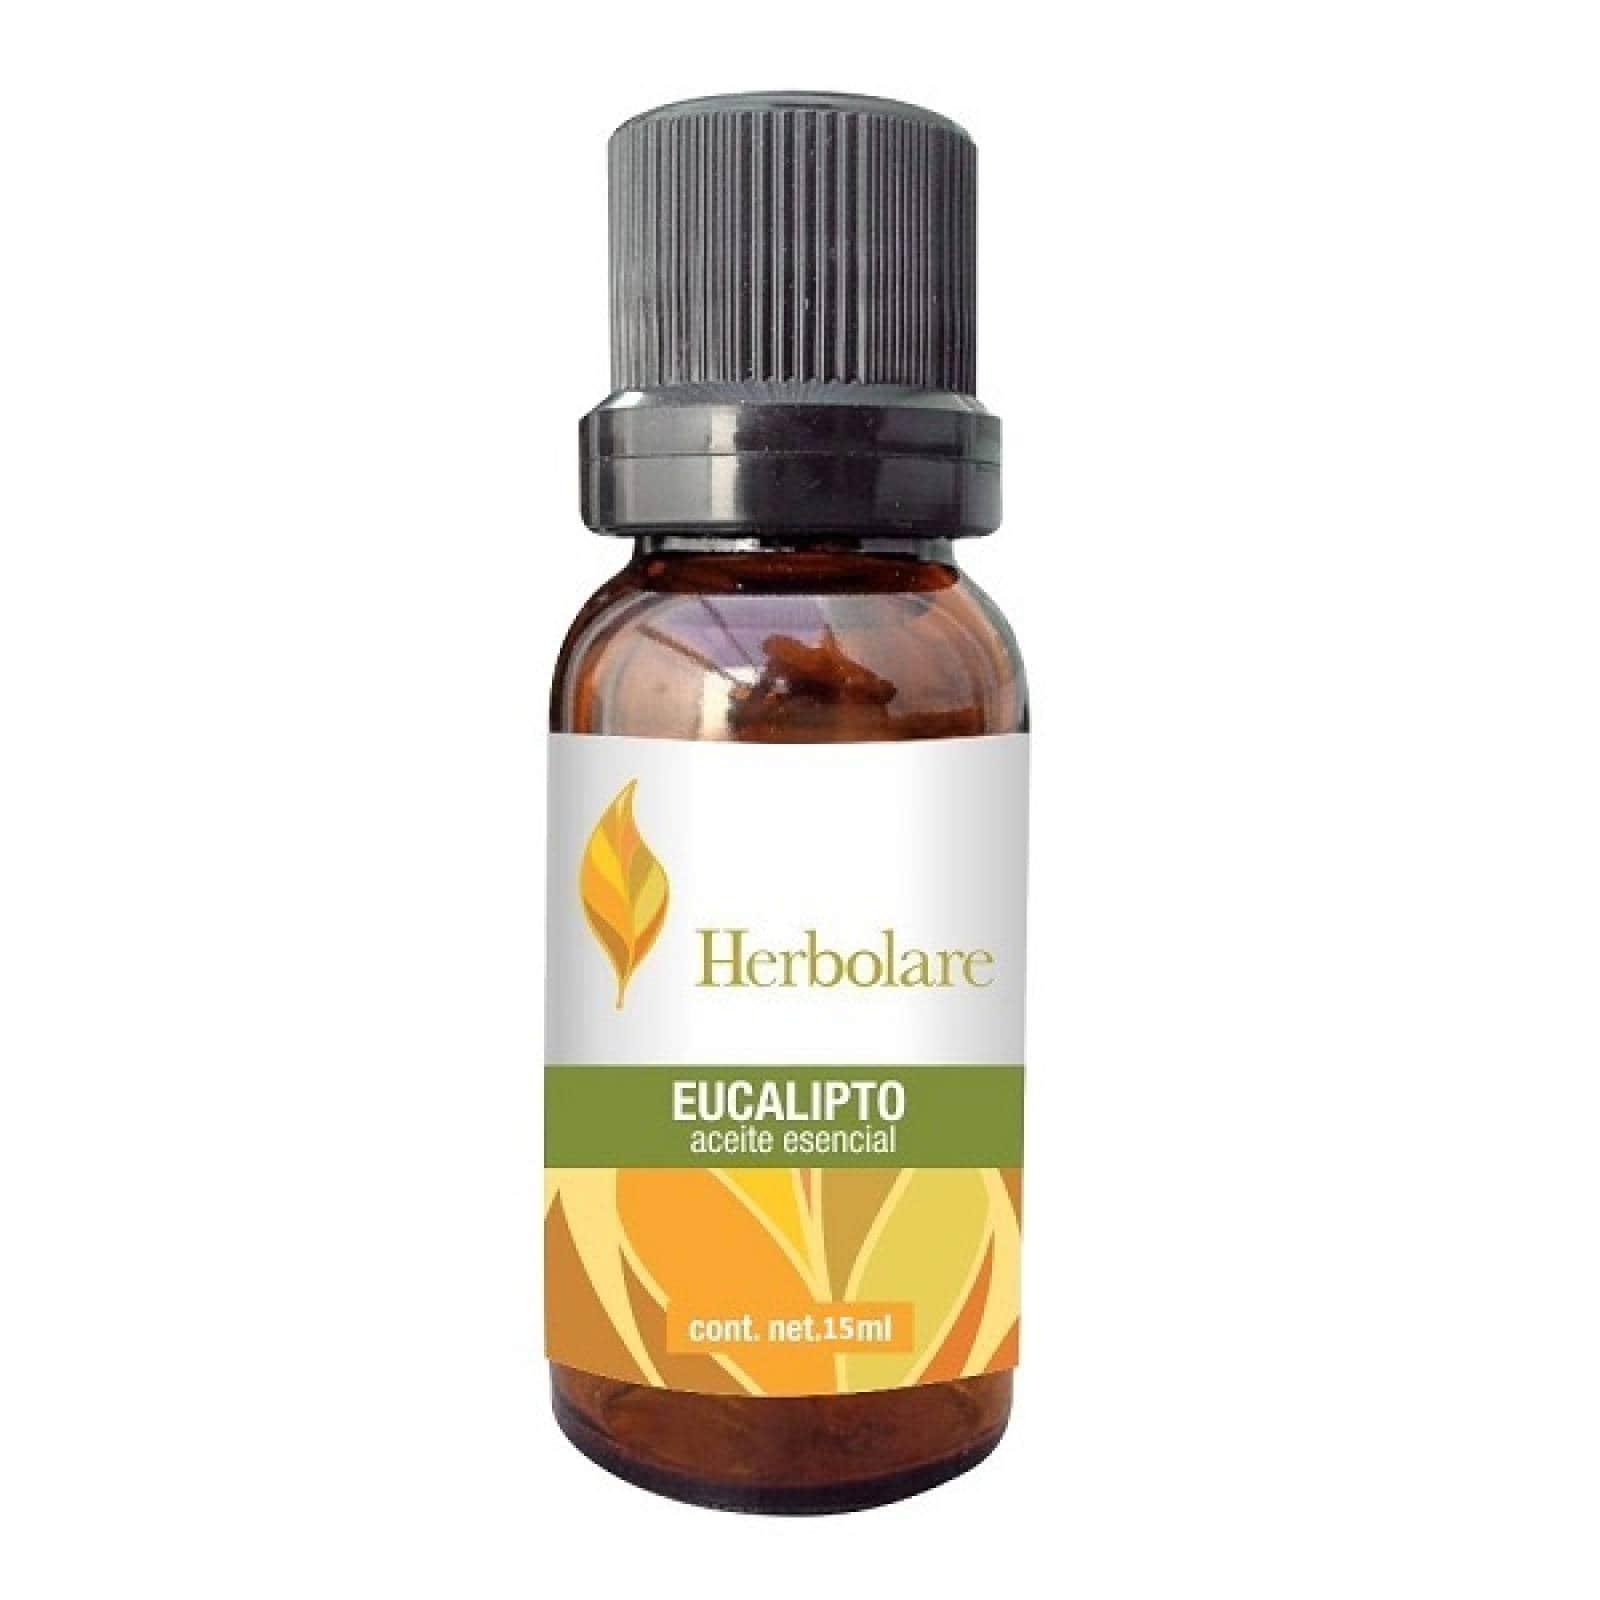 Aceite Esencial Eucalipto 15ml Aromaterapia Masaje Herbolare